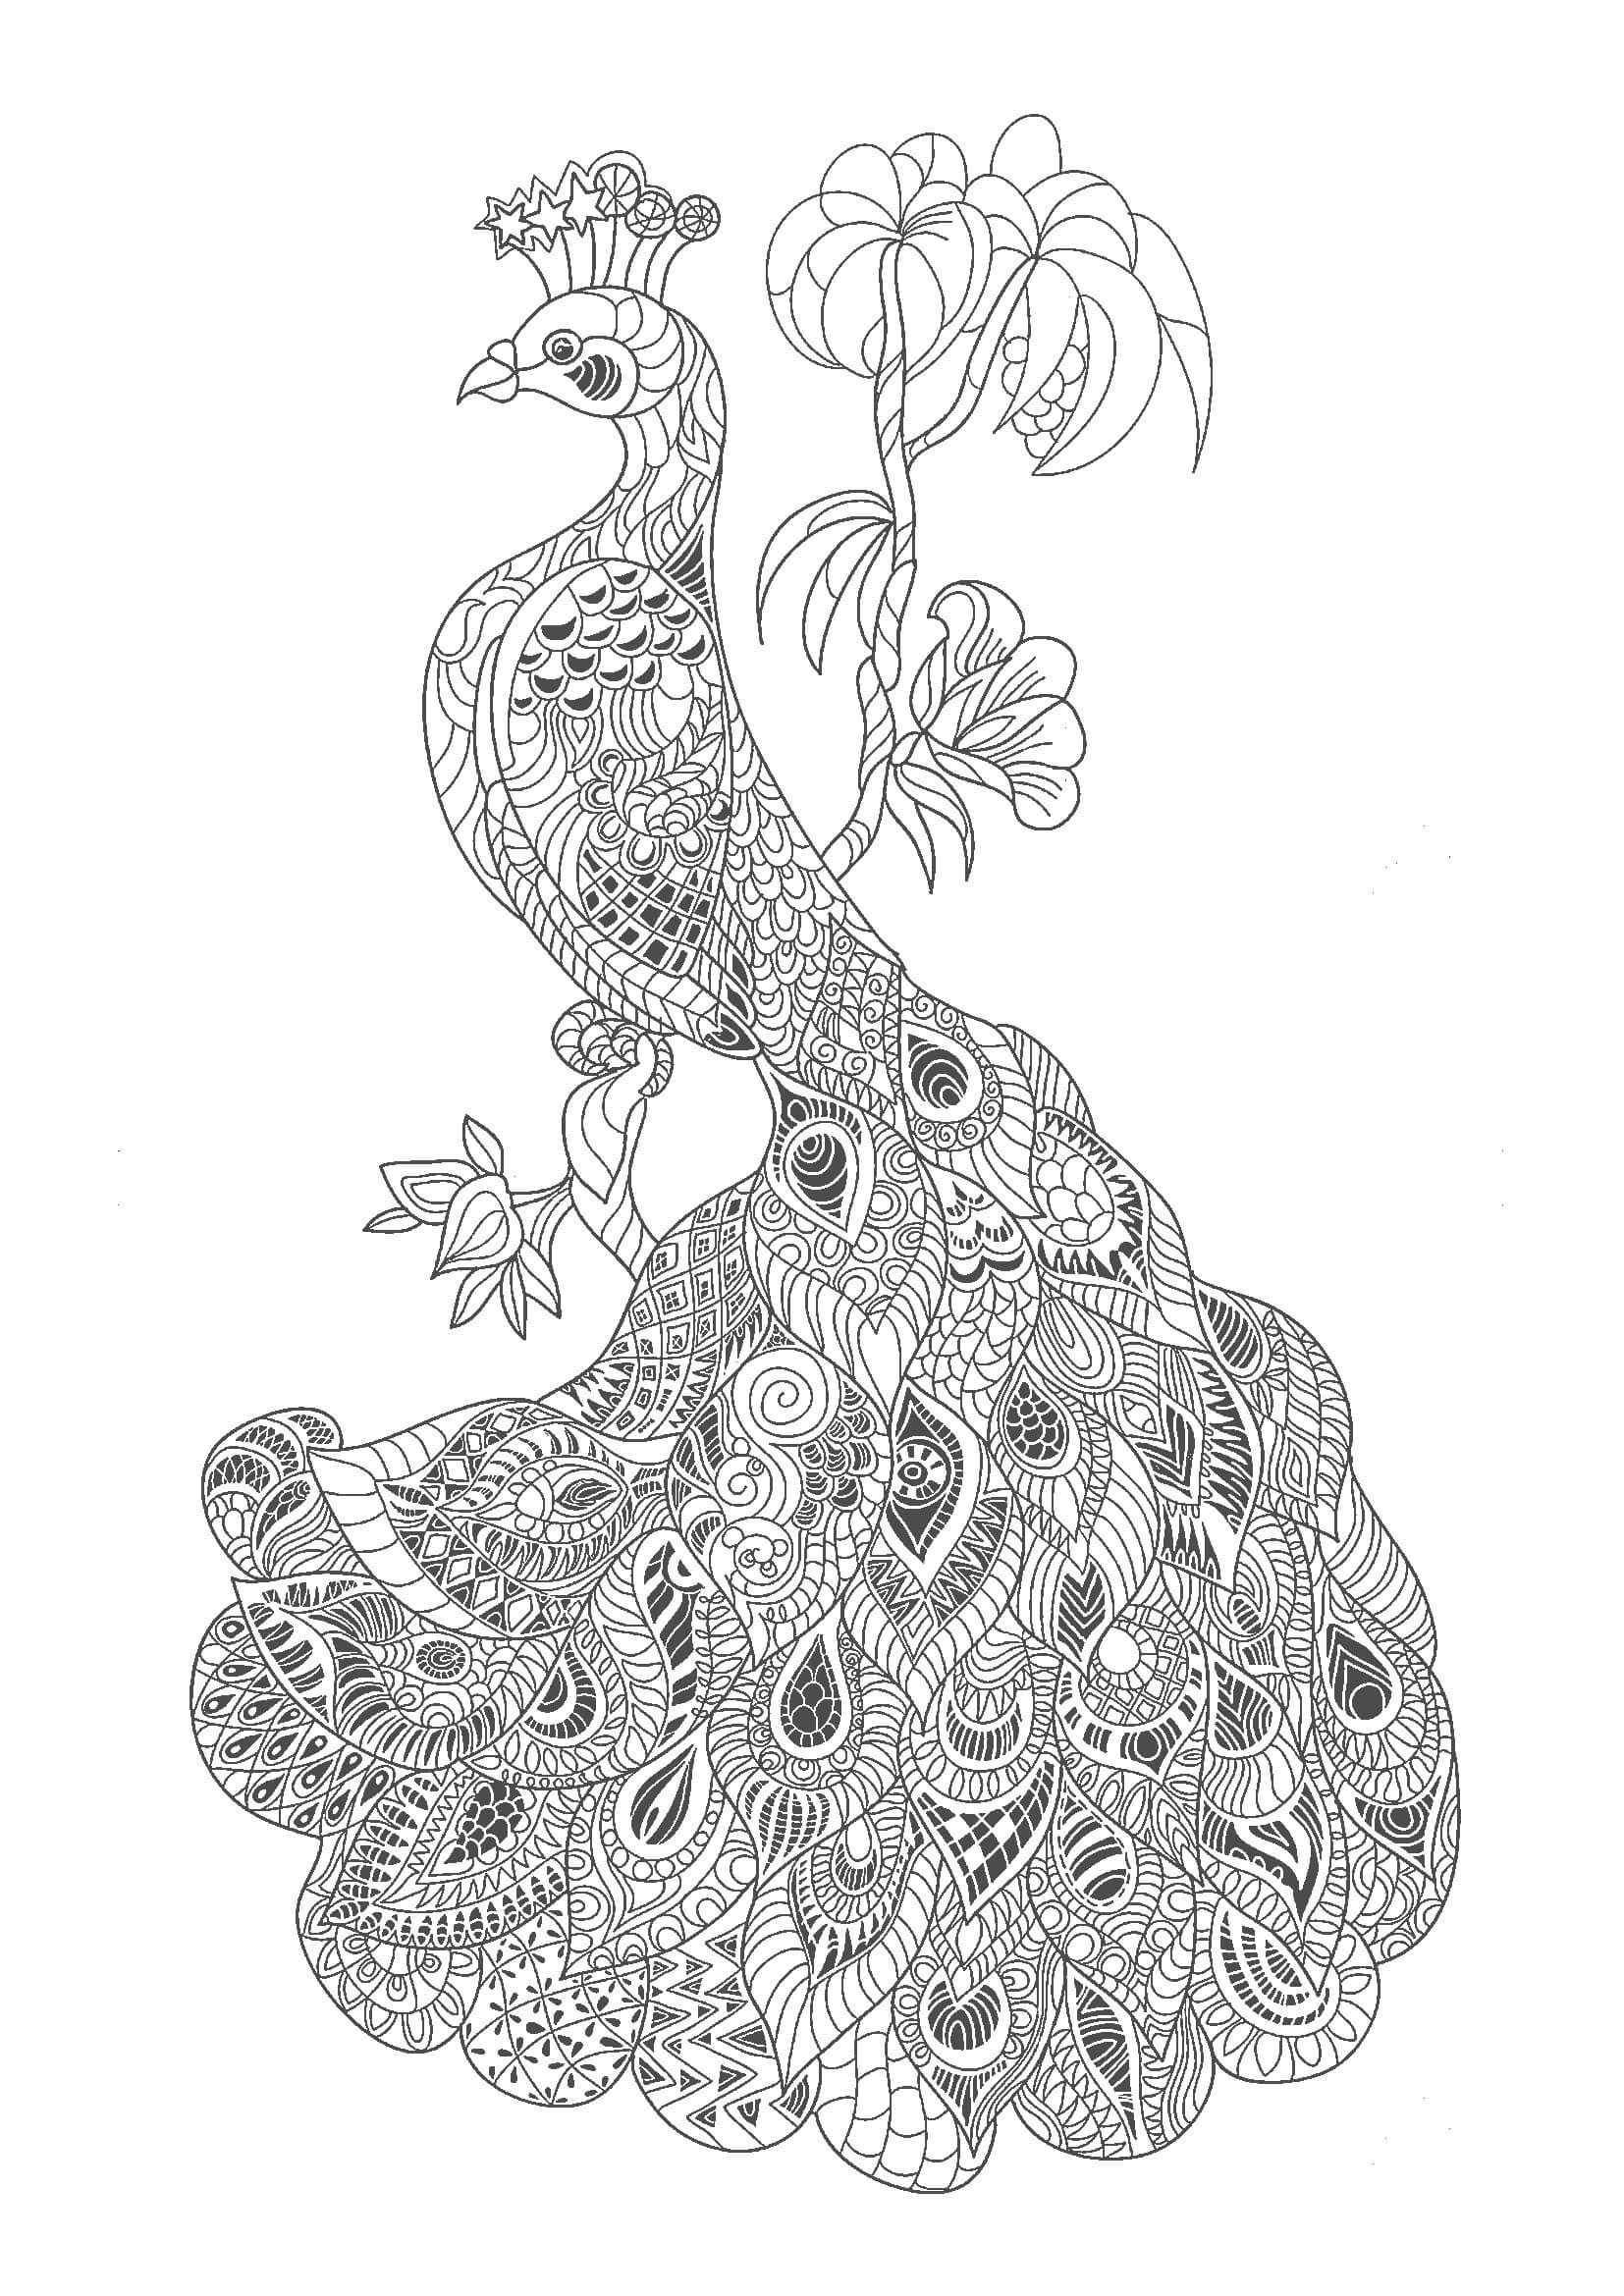 Otonanonurie Bird02 Jpg 1 654 2 339ピクセル 塗り絵 無料 塗り絵 塗り絵 無料 花